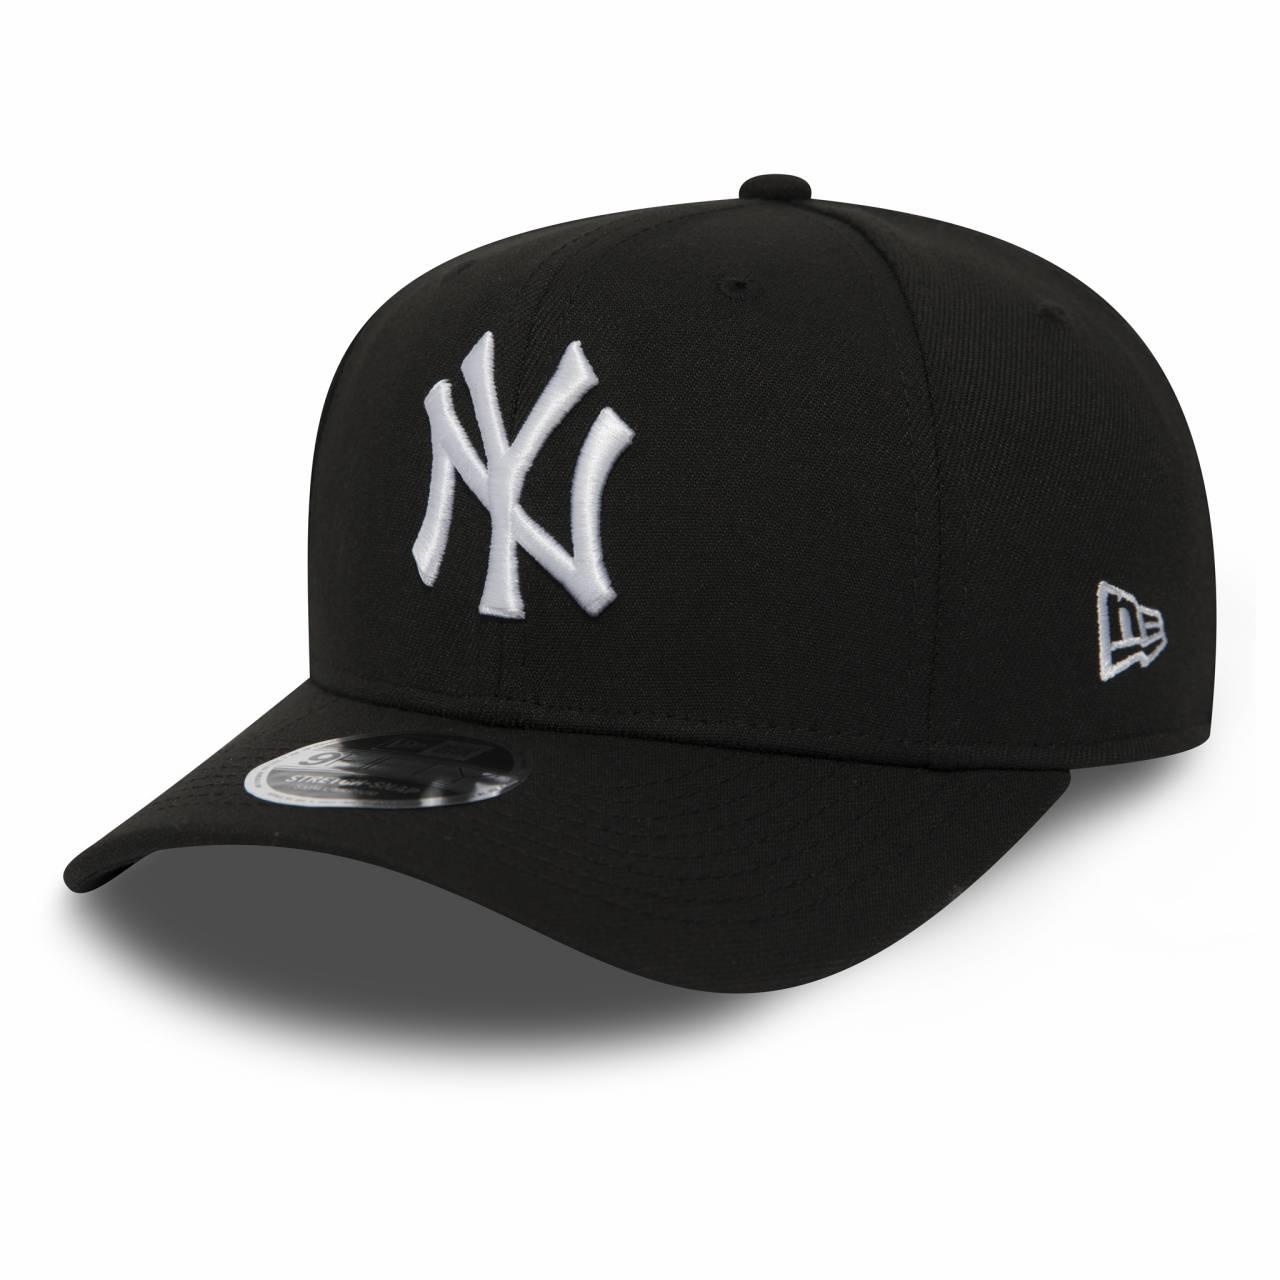 9FIFTY MLB NEW YORK YANKEES STRETCH SNAP BLACK